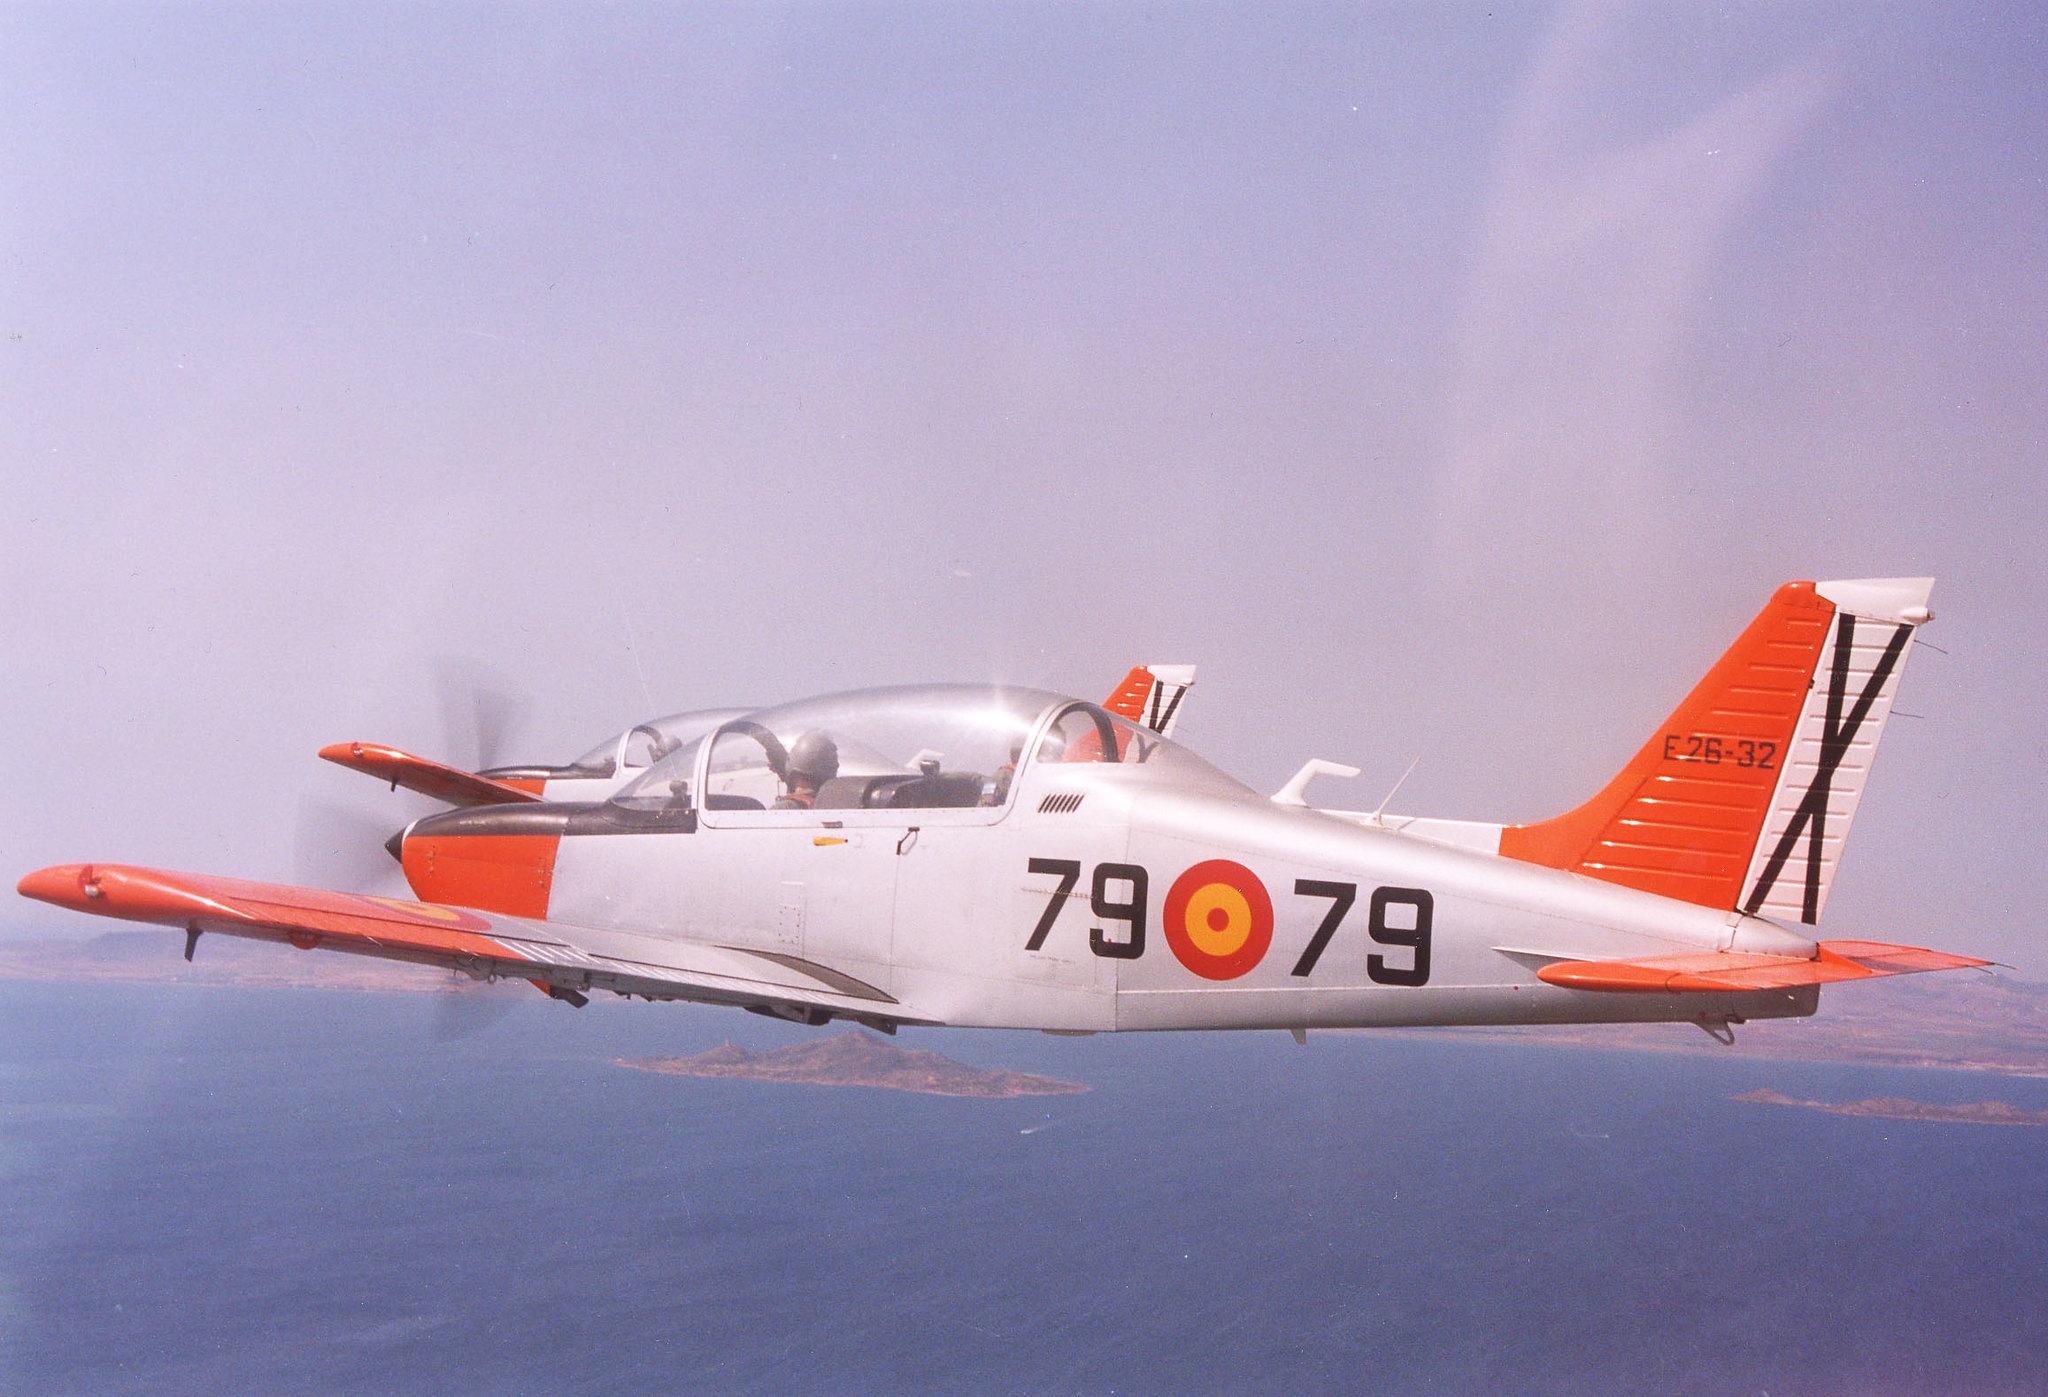 Dibujo del perfil de la aeronave Enaer T-35C -Tamiz- (E-26)